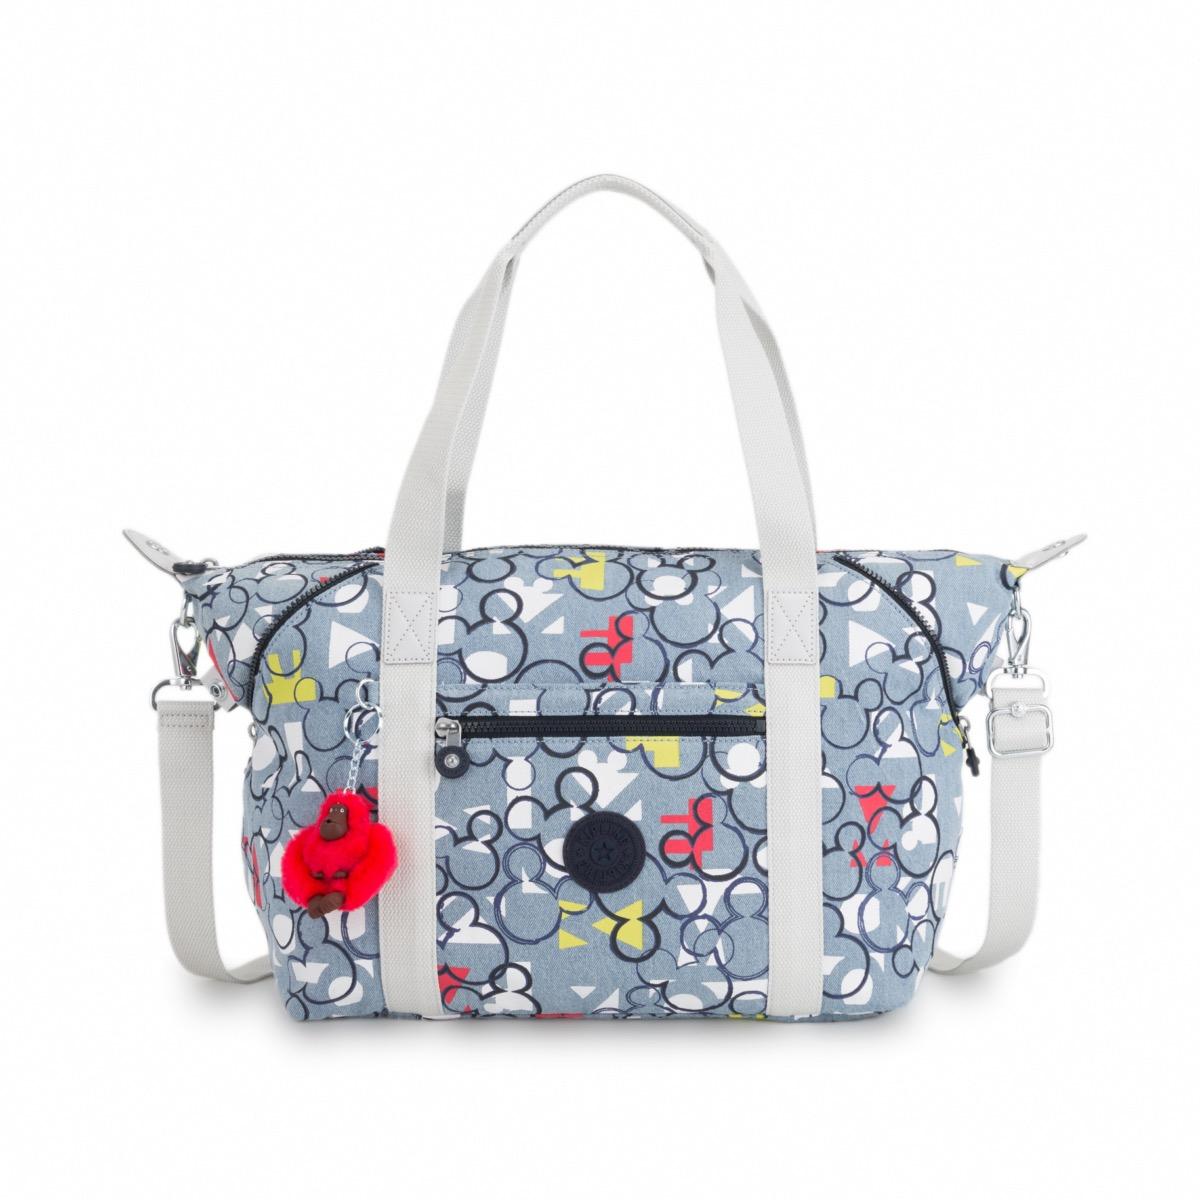 724a9f1feffe Kipling Disney D Art Medium Tote Bag with removable shoulder strap in  Threecheer